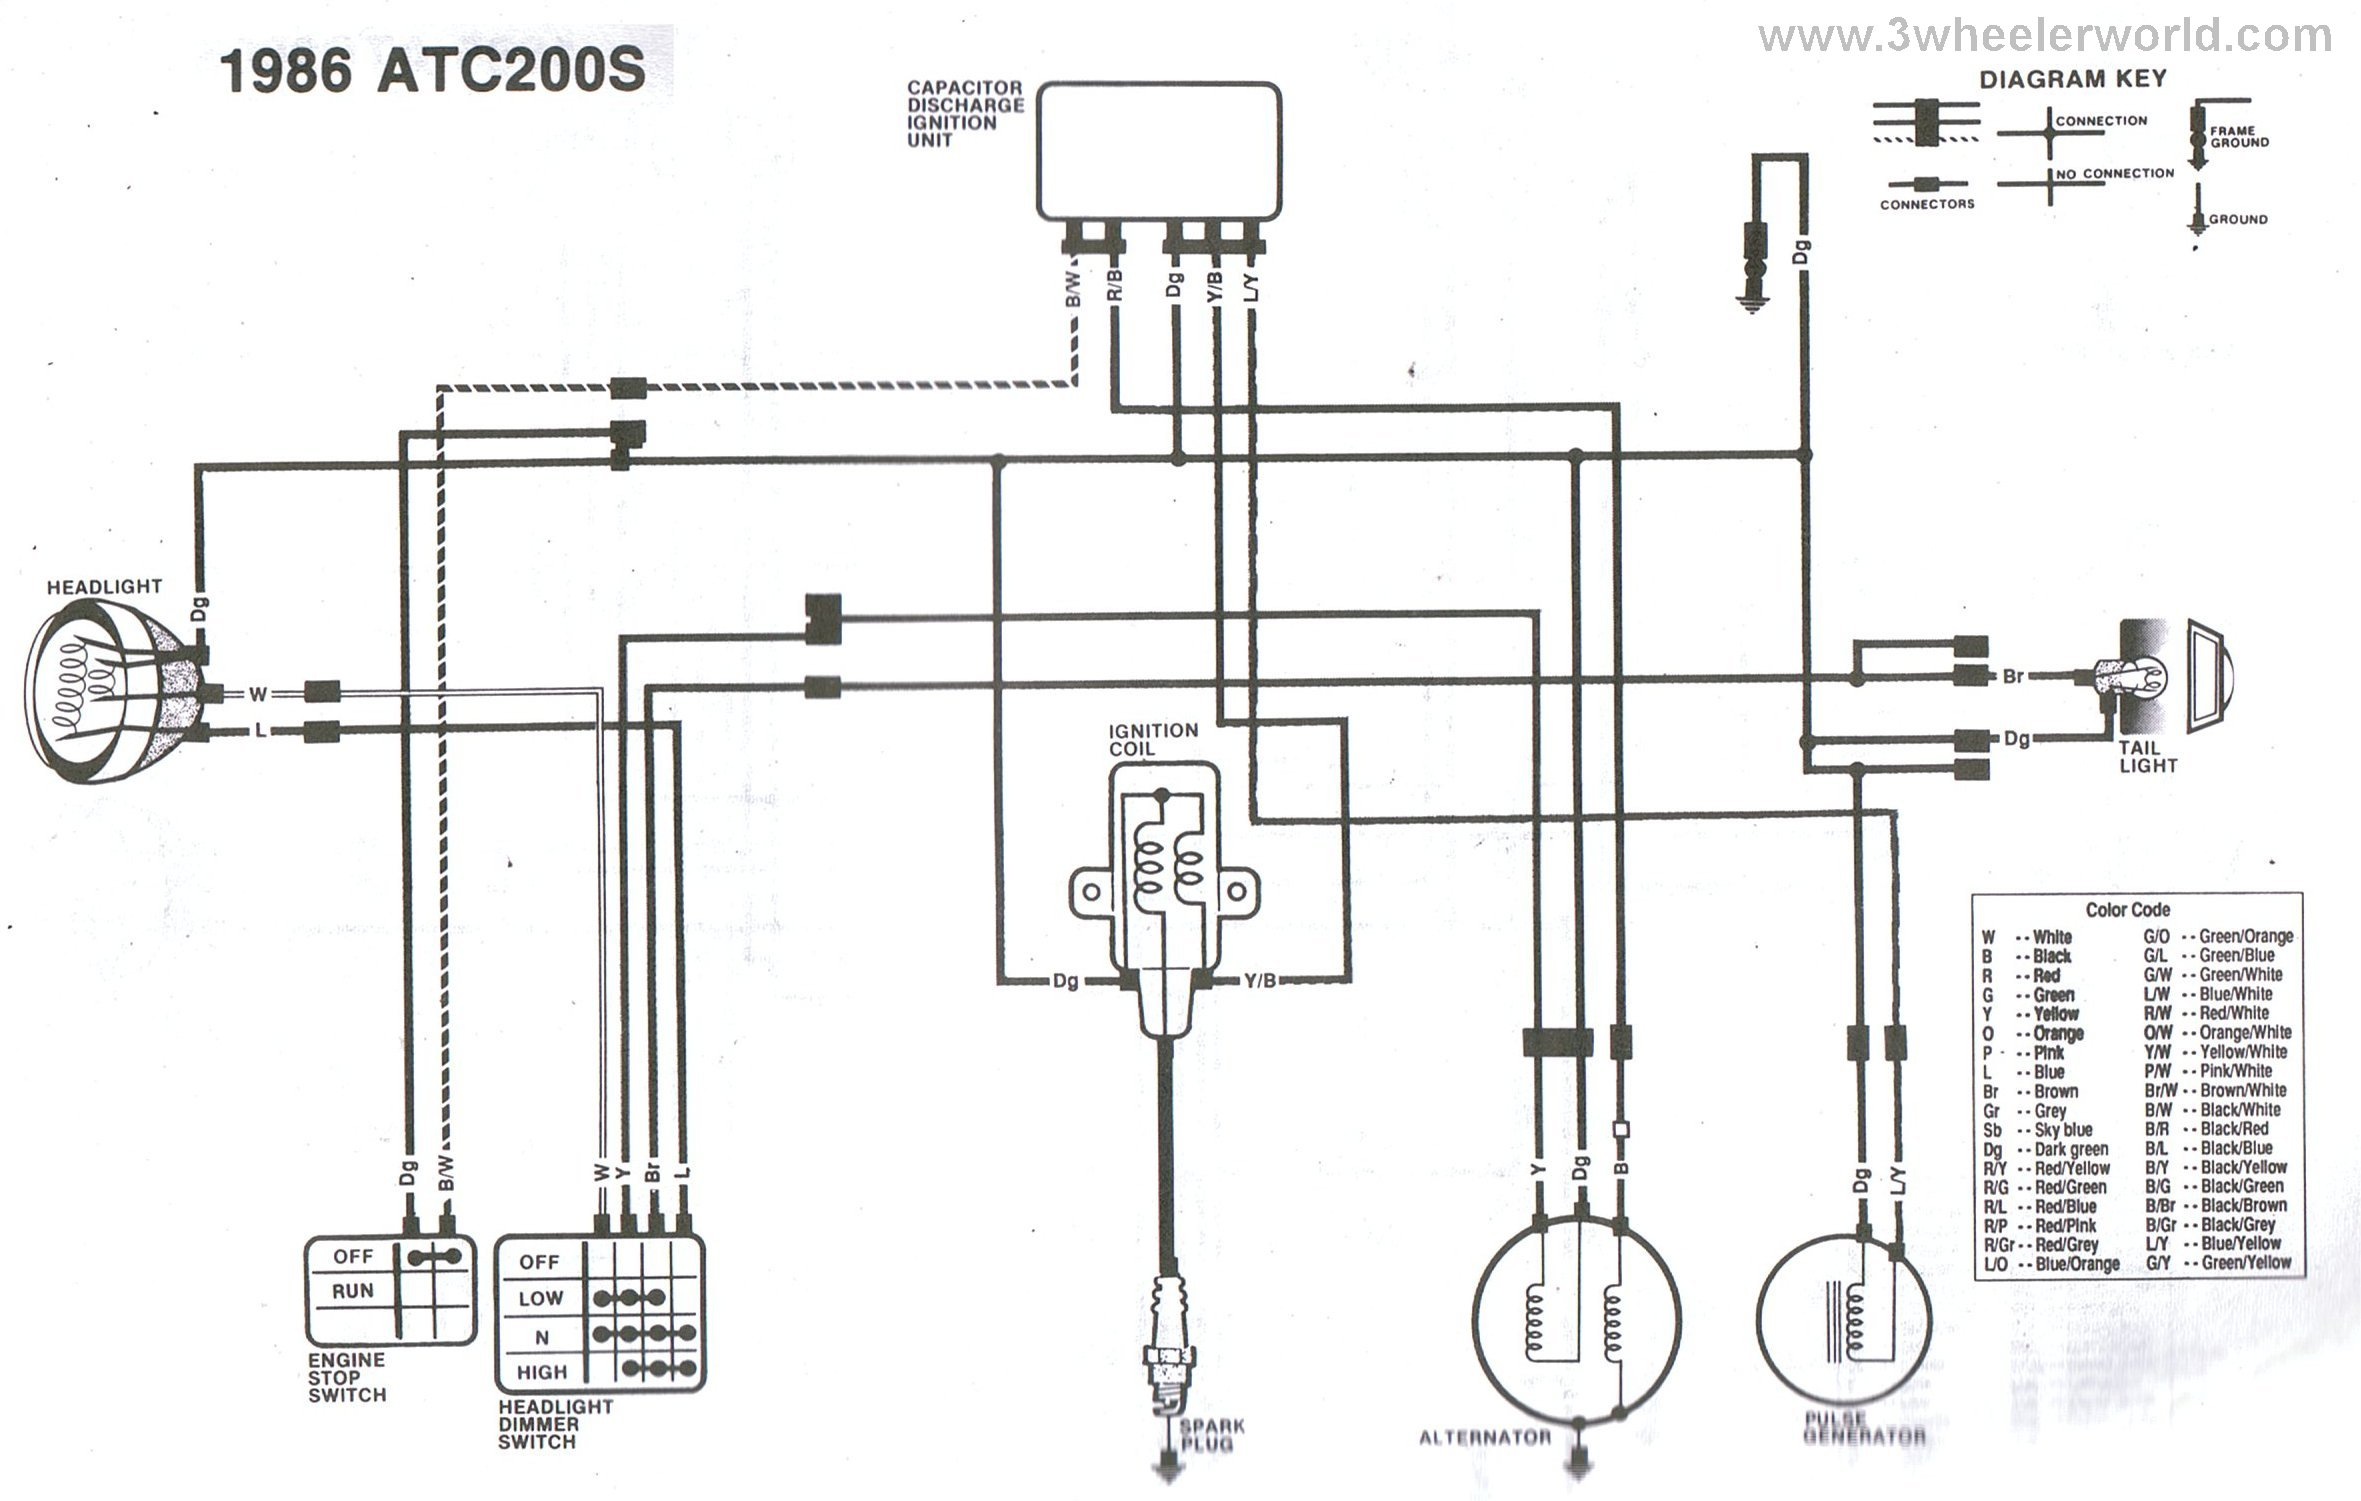 EZ_4486] Honda Trail 90 Wiring Diagram Together With 84 Honda 125 Atc  Wiring Schematic WiringXtern Oxyl Terst Benol Stica Nnigh Weasi Emba Mohammedshrine Librar Wiring  101